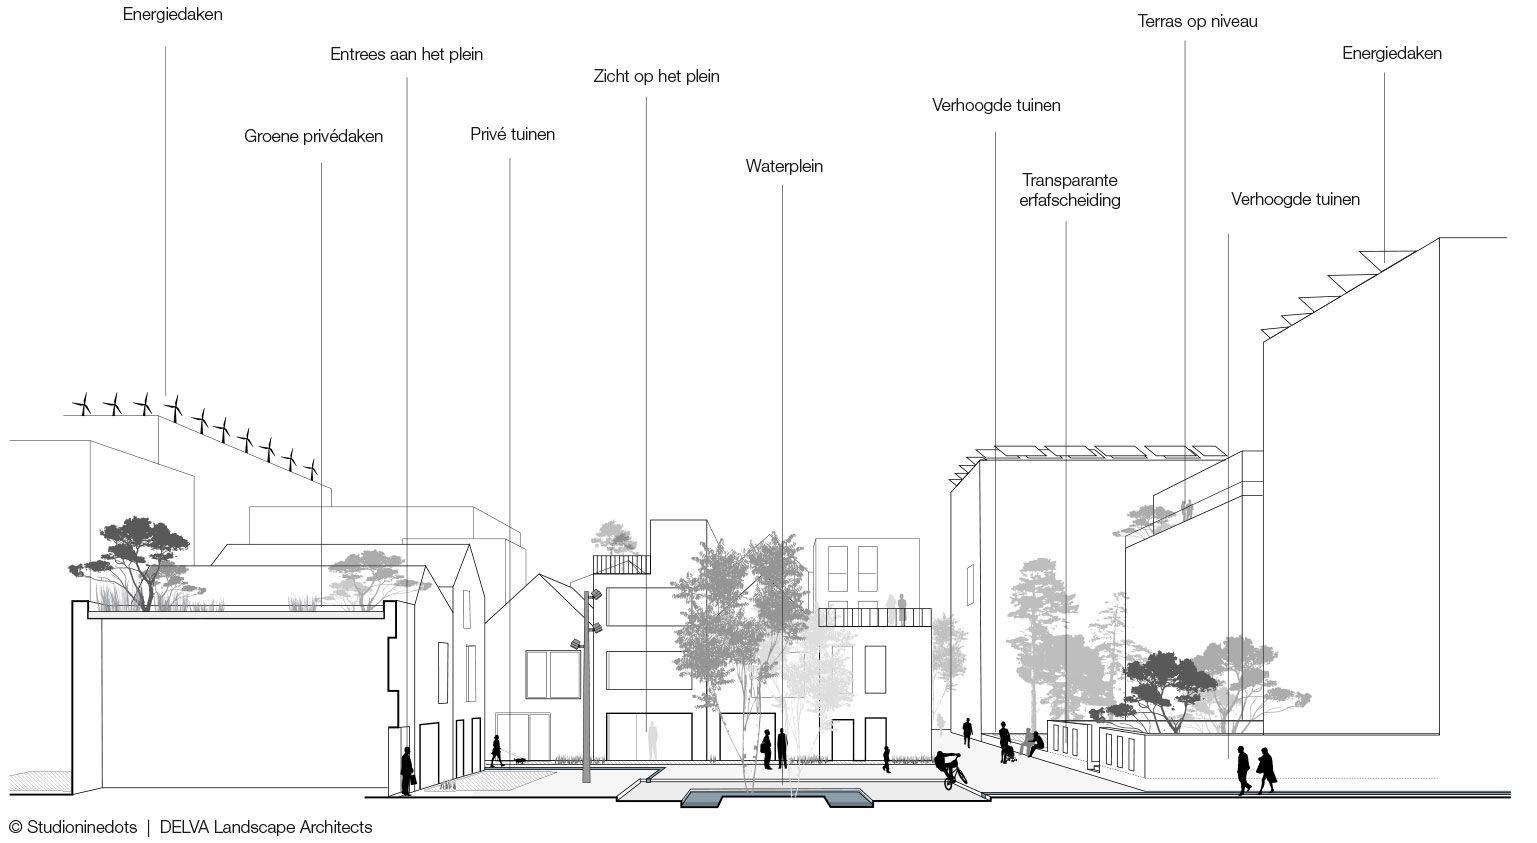 Dynamisch Masterplan Buiksloterham - Amsterdam - Delva Landscape ArchitectsDelva Landscape Architects